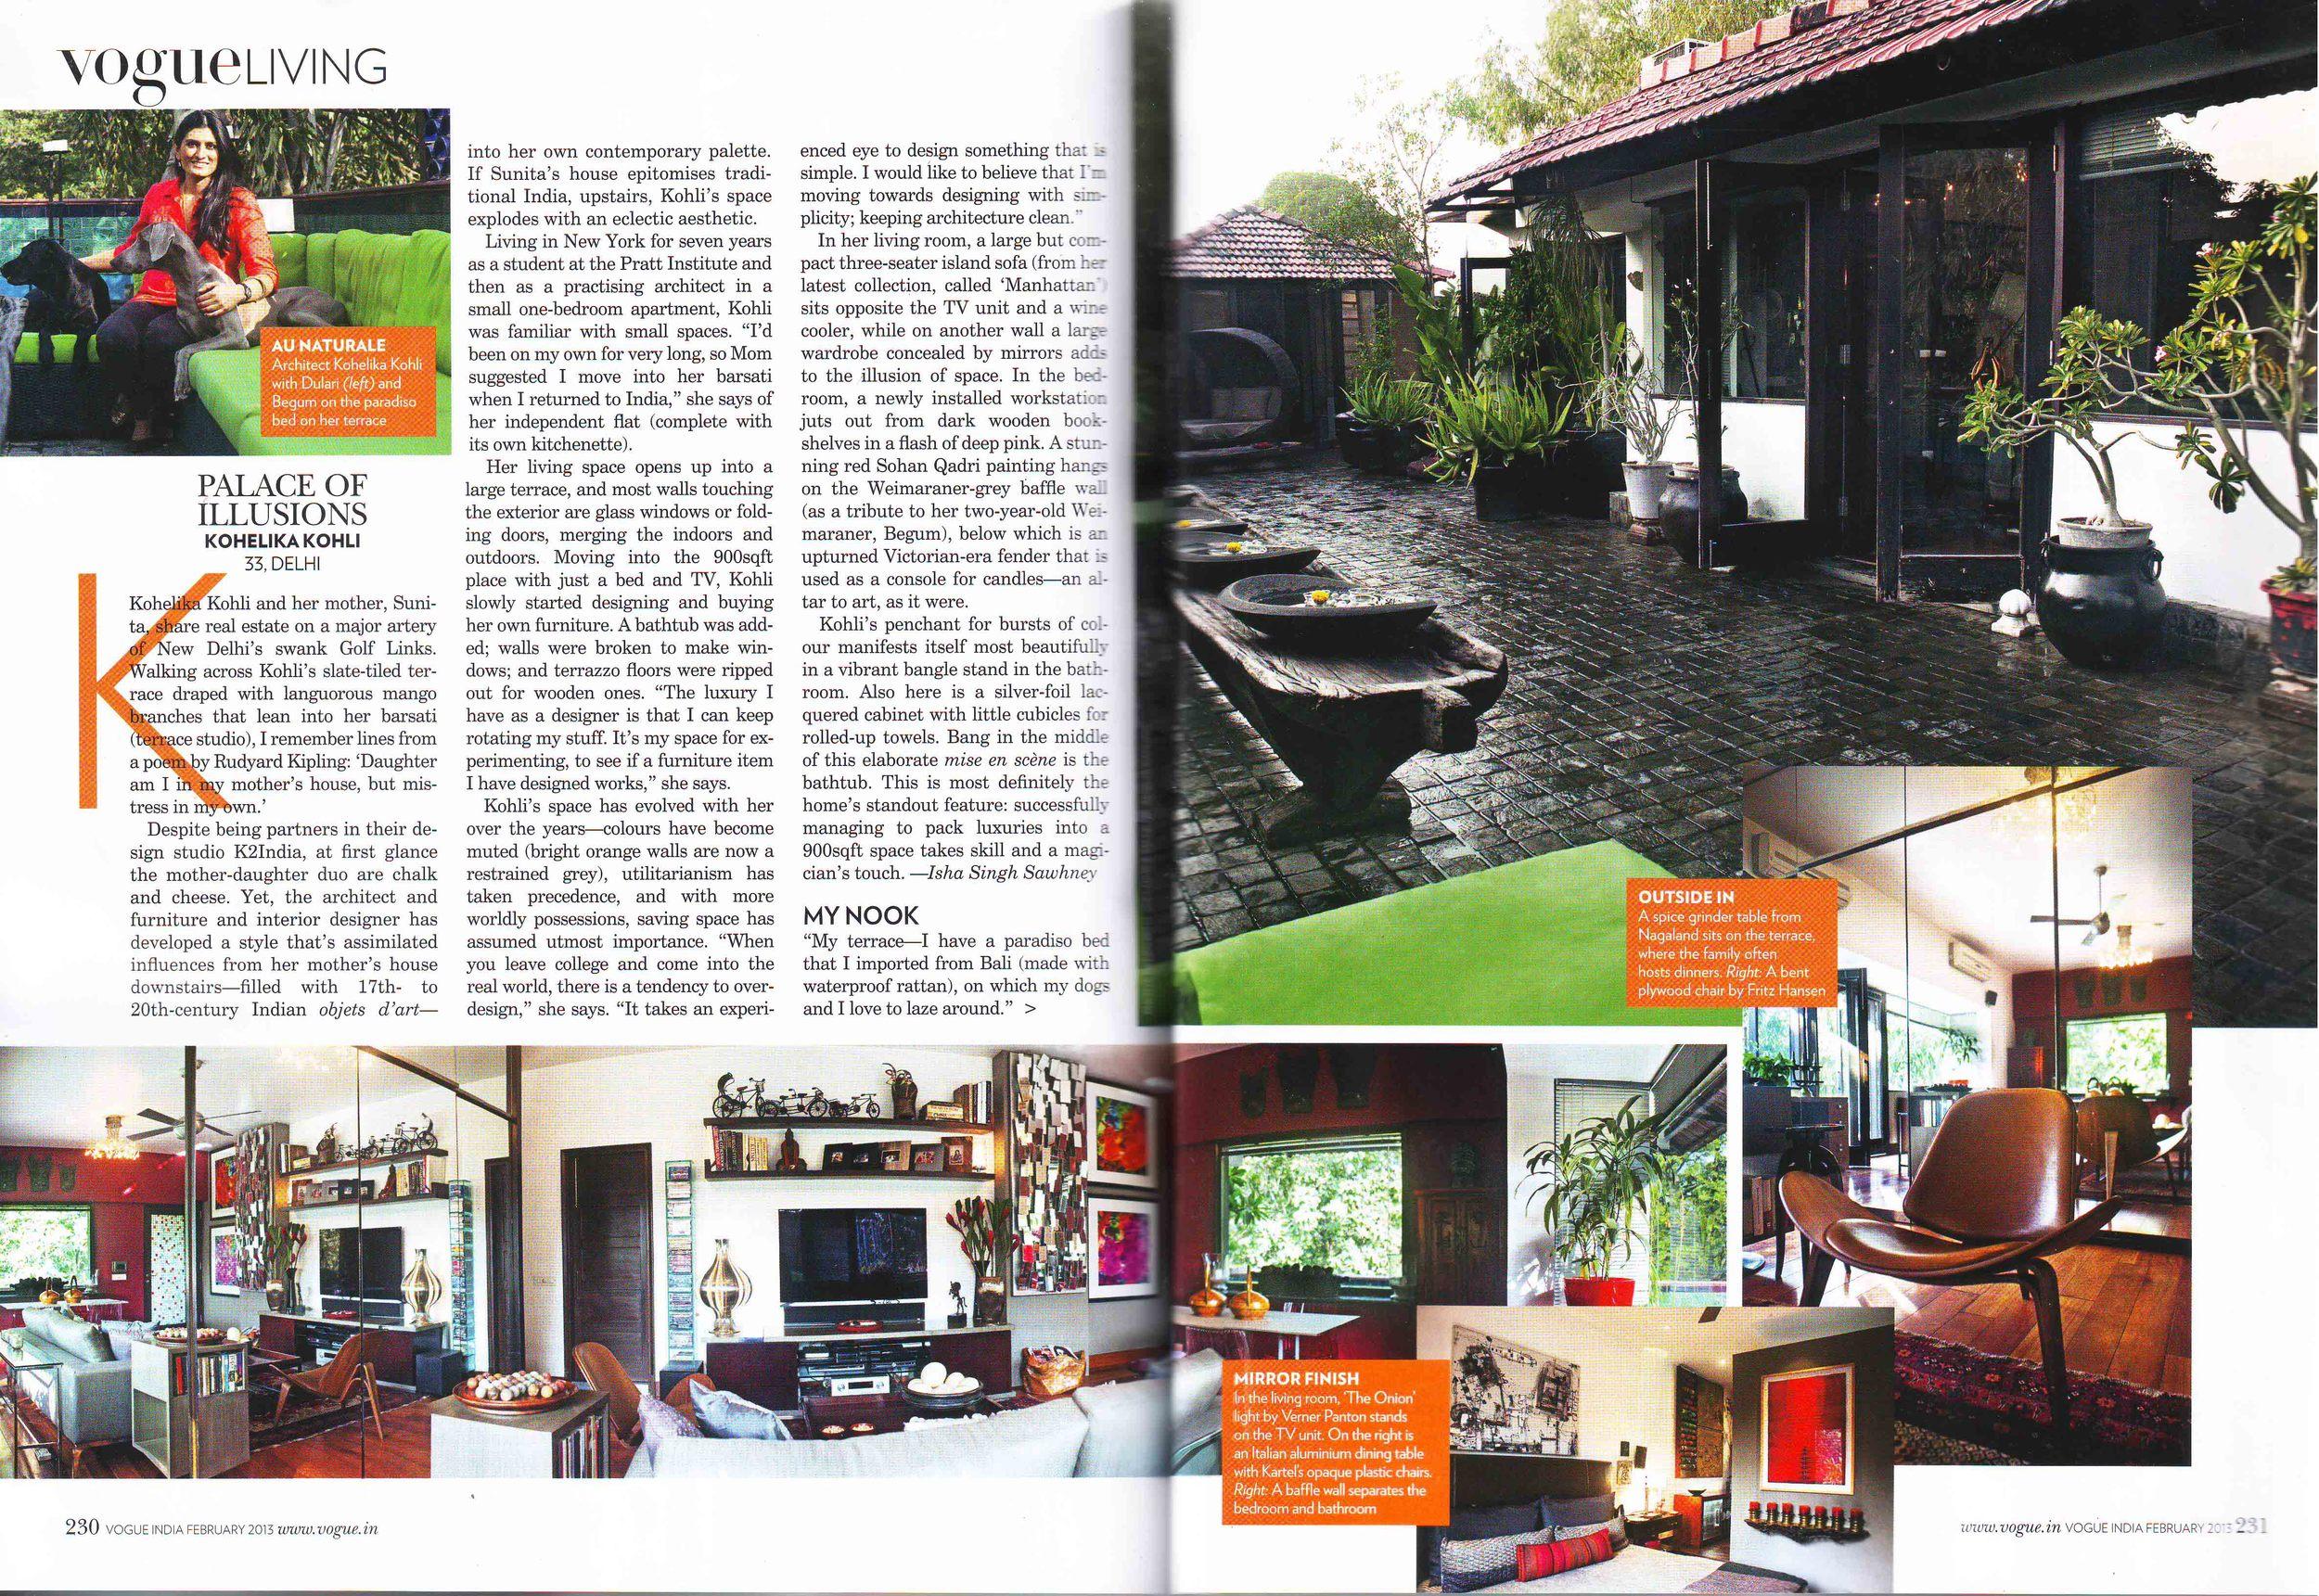 Vogue living 2.jpg